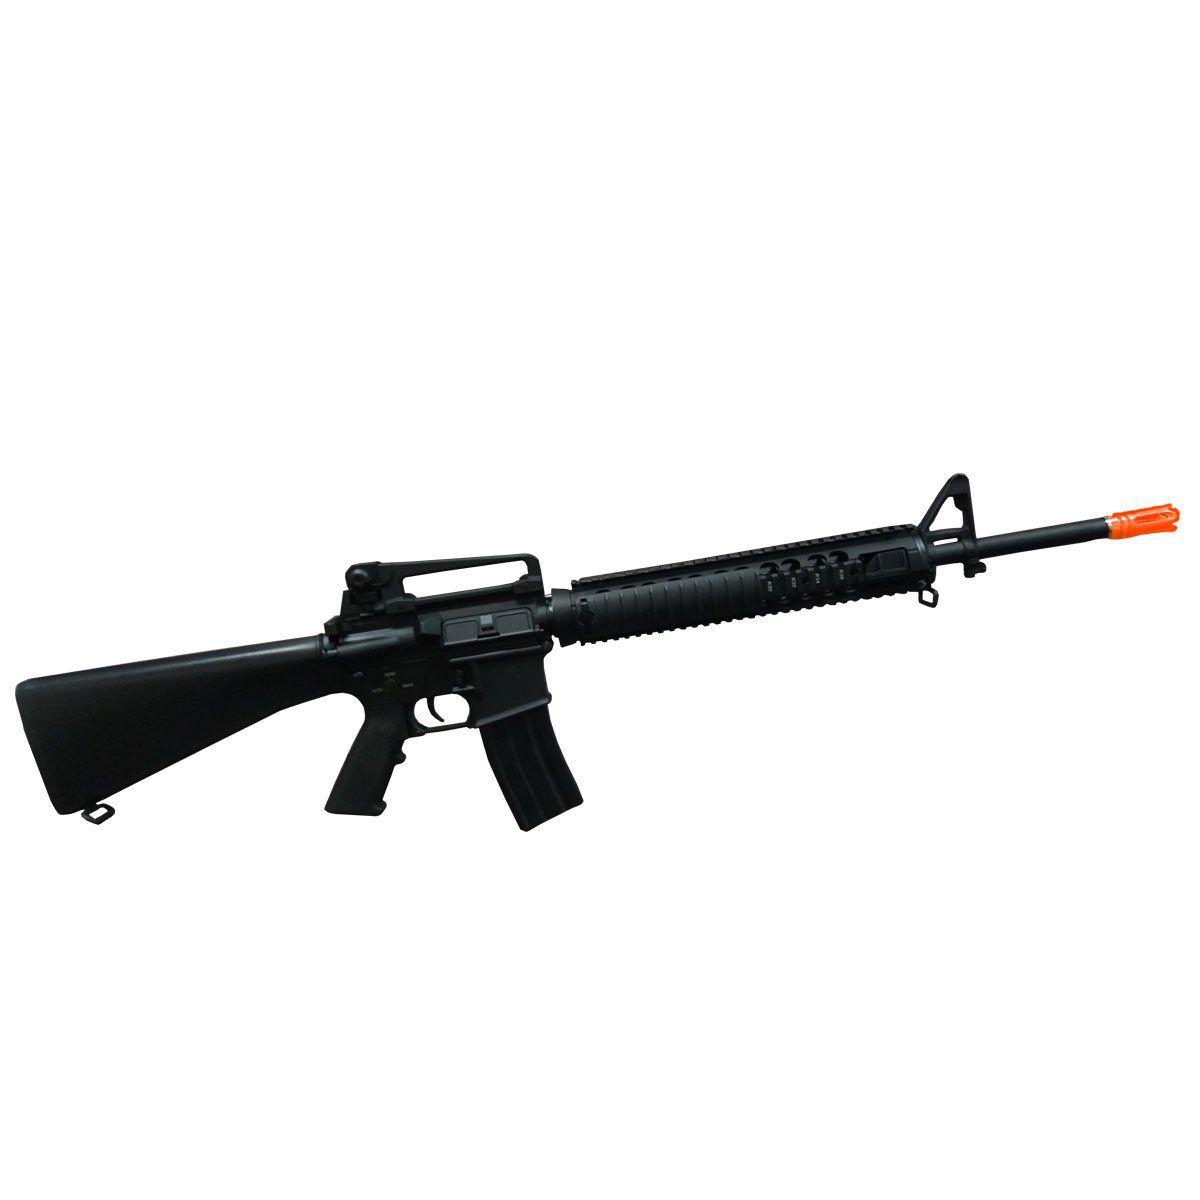 Rifle de Airsoft D-boys M16A4 Ris Full Metal Elétrico